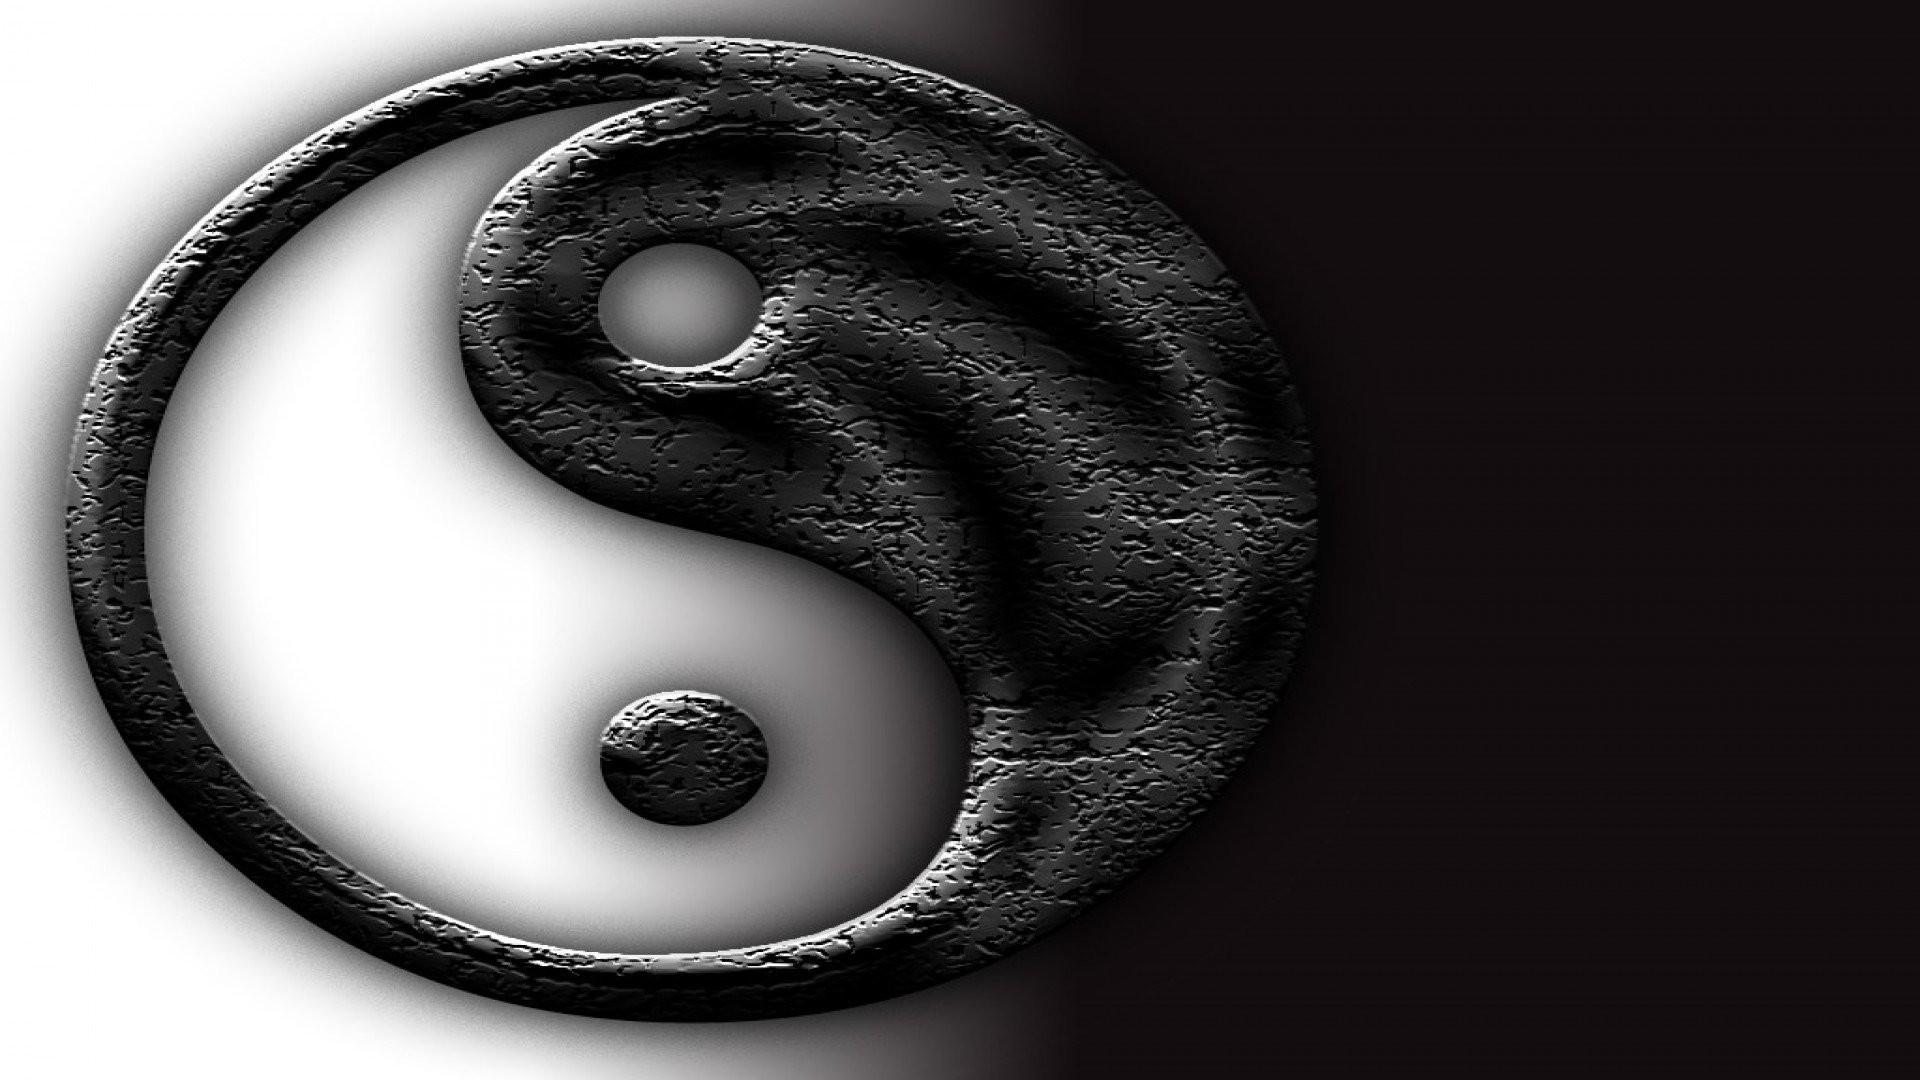 Cracked Yin Yang